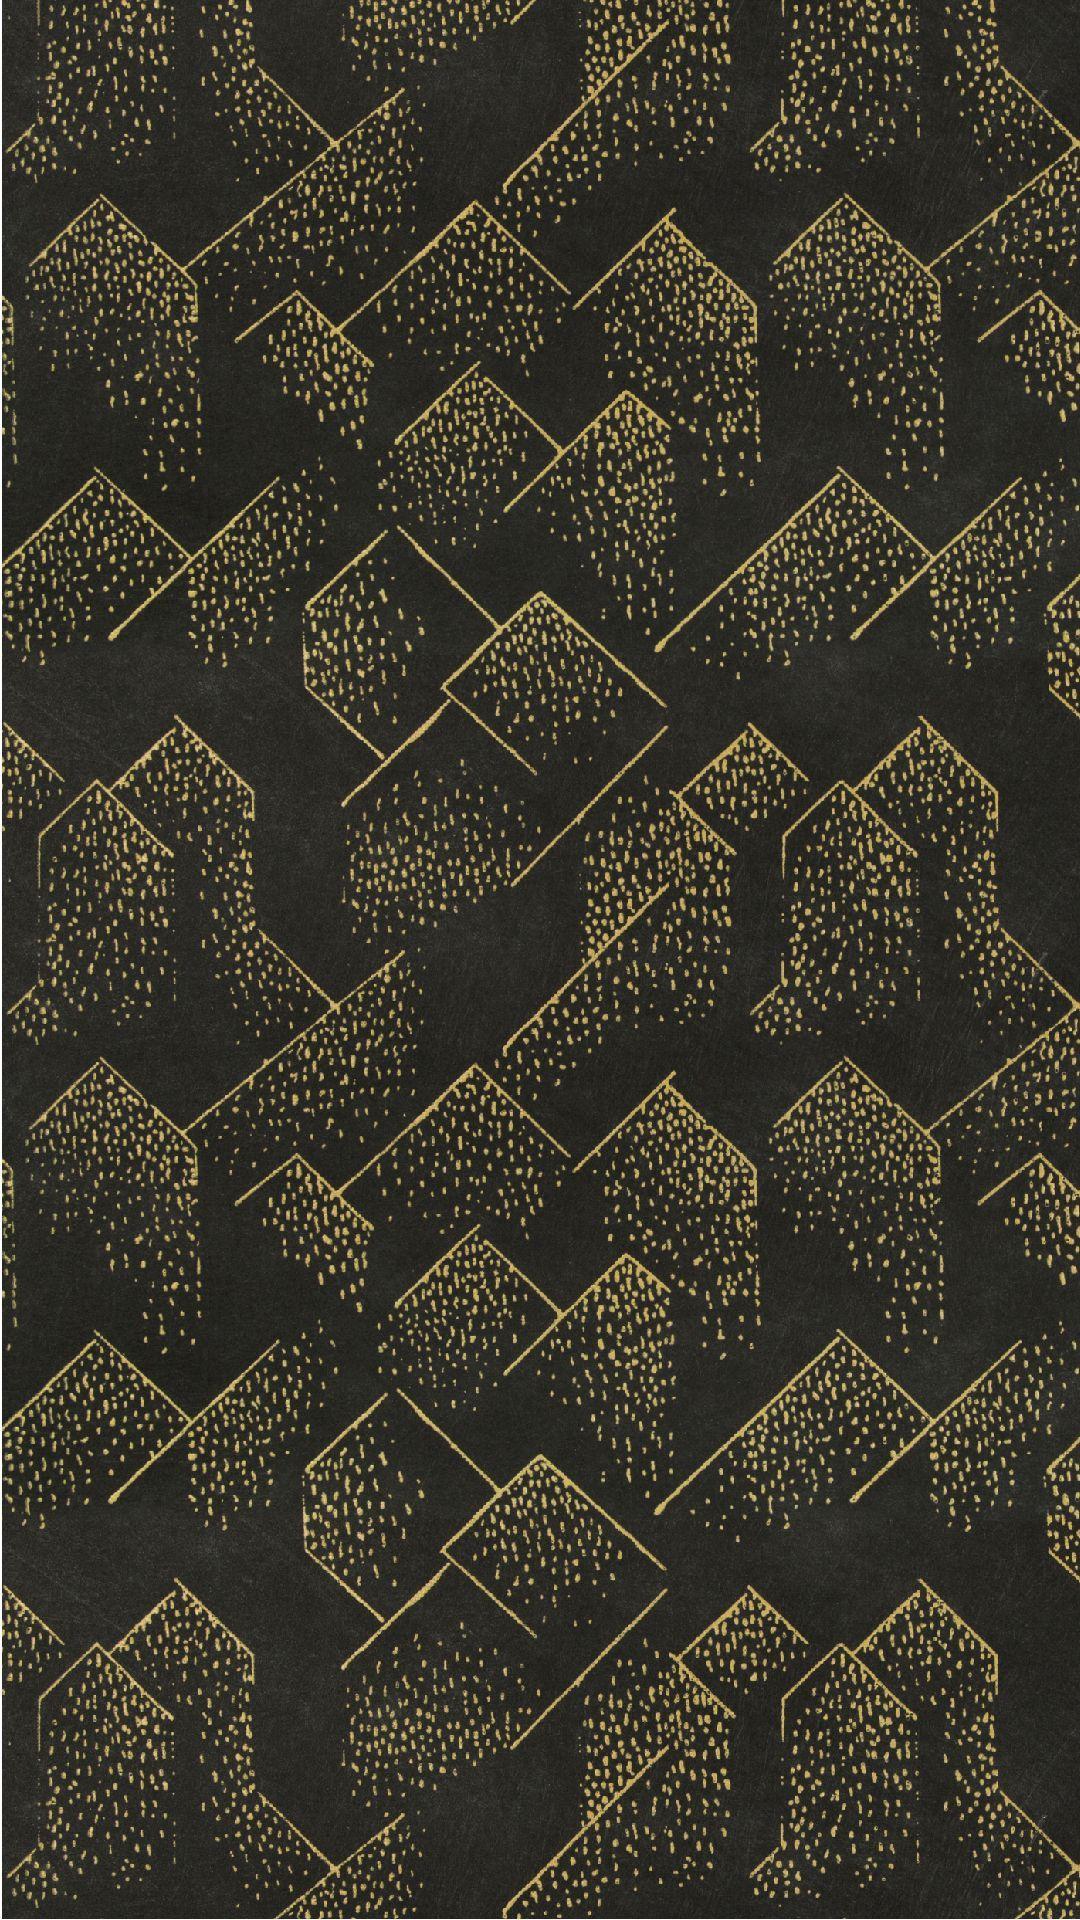 Geometric Navy Wallpaper Iphone in 2020 Navy wallpaper